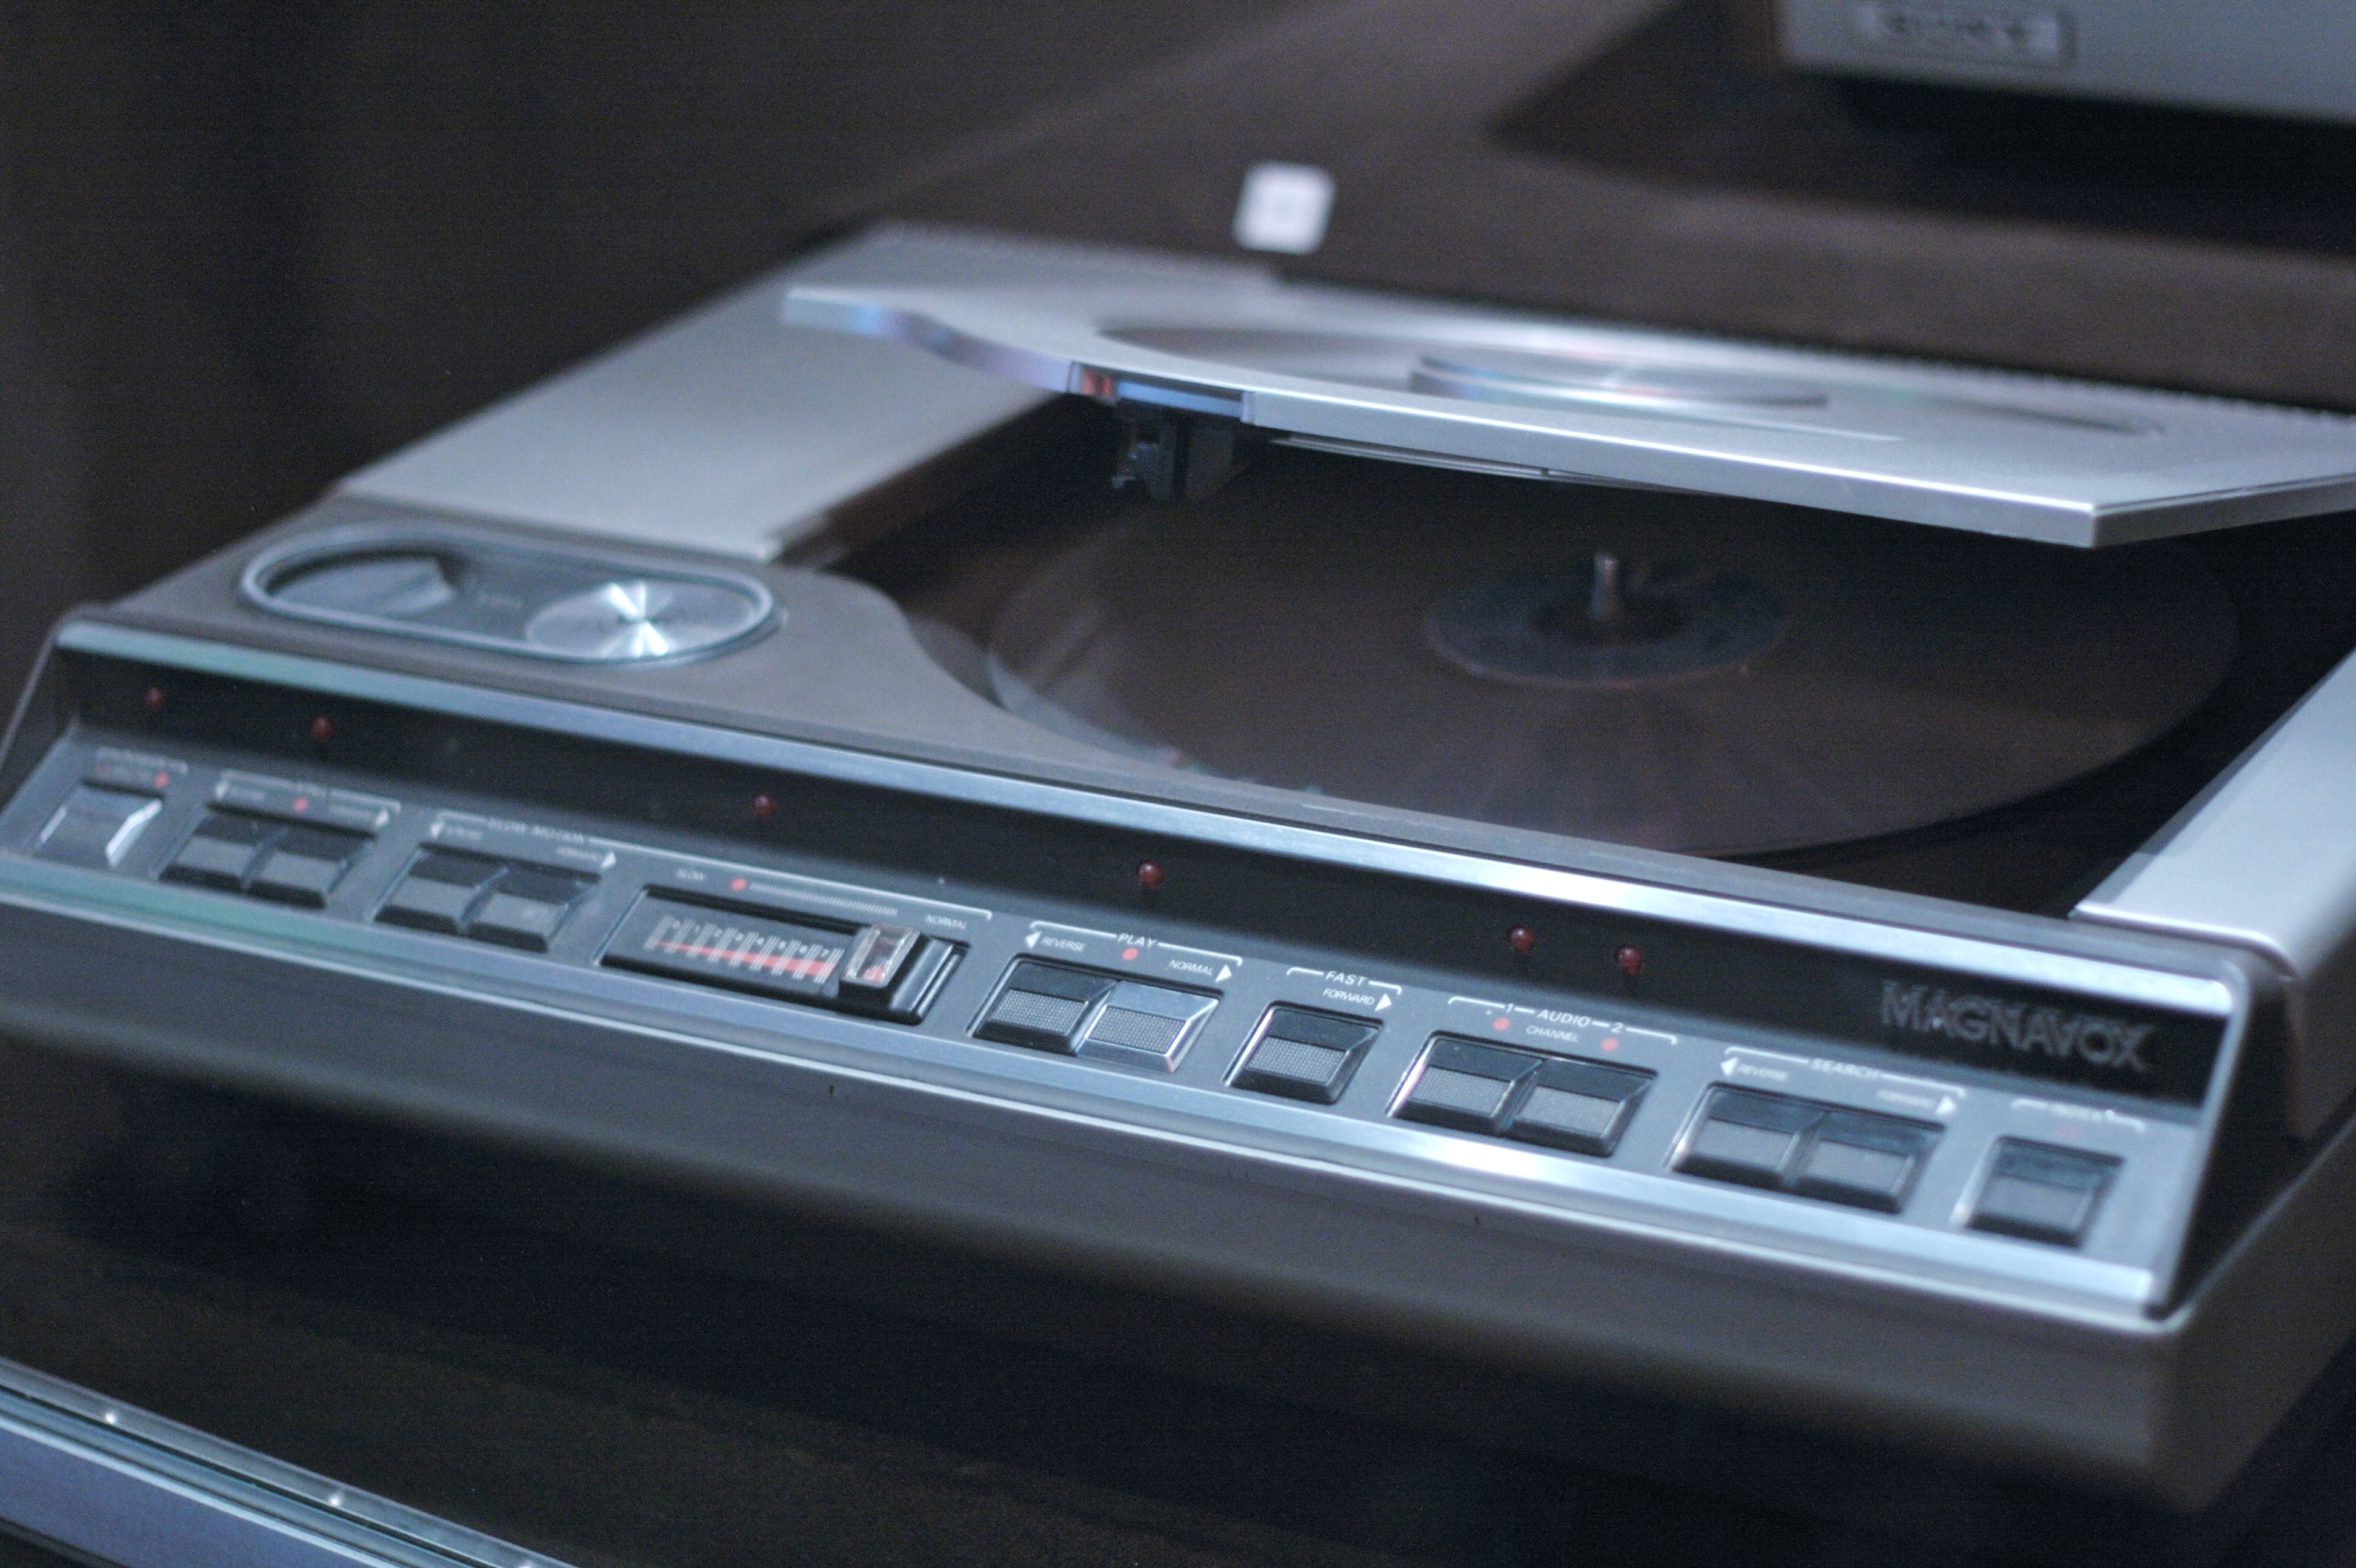 File:Magnavox Laserdisc player.jpg